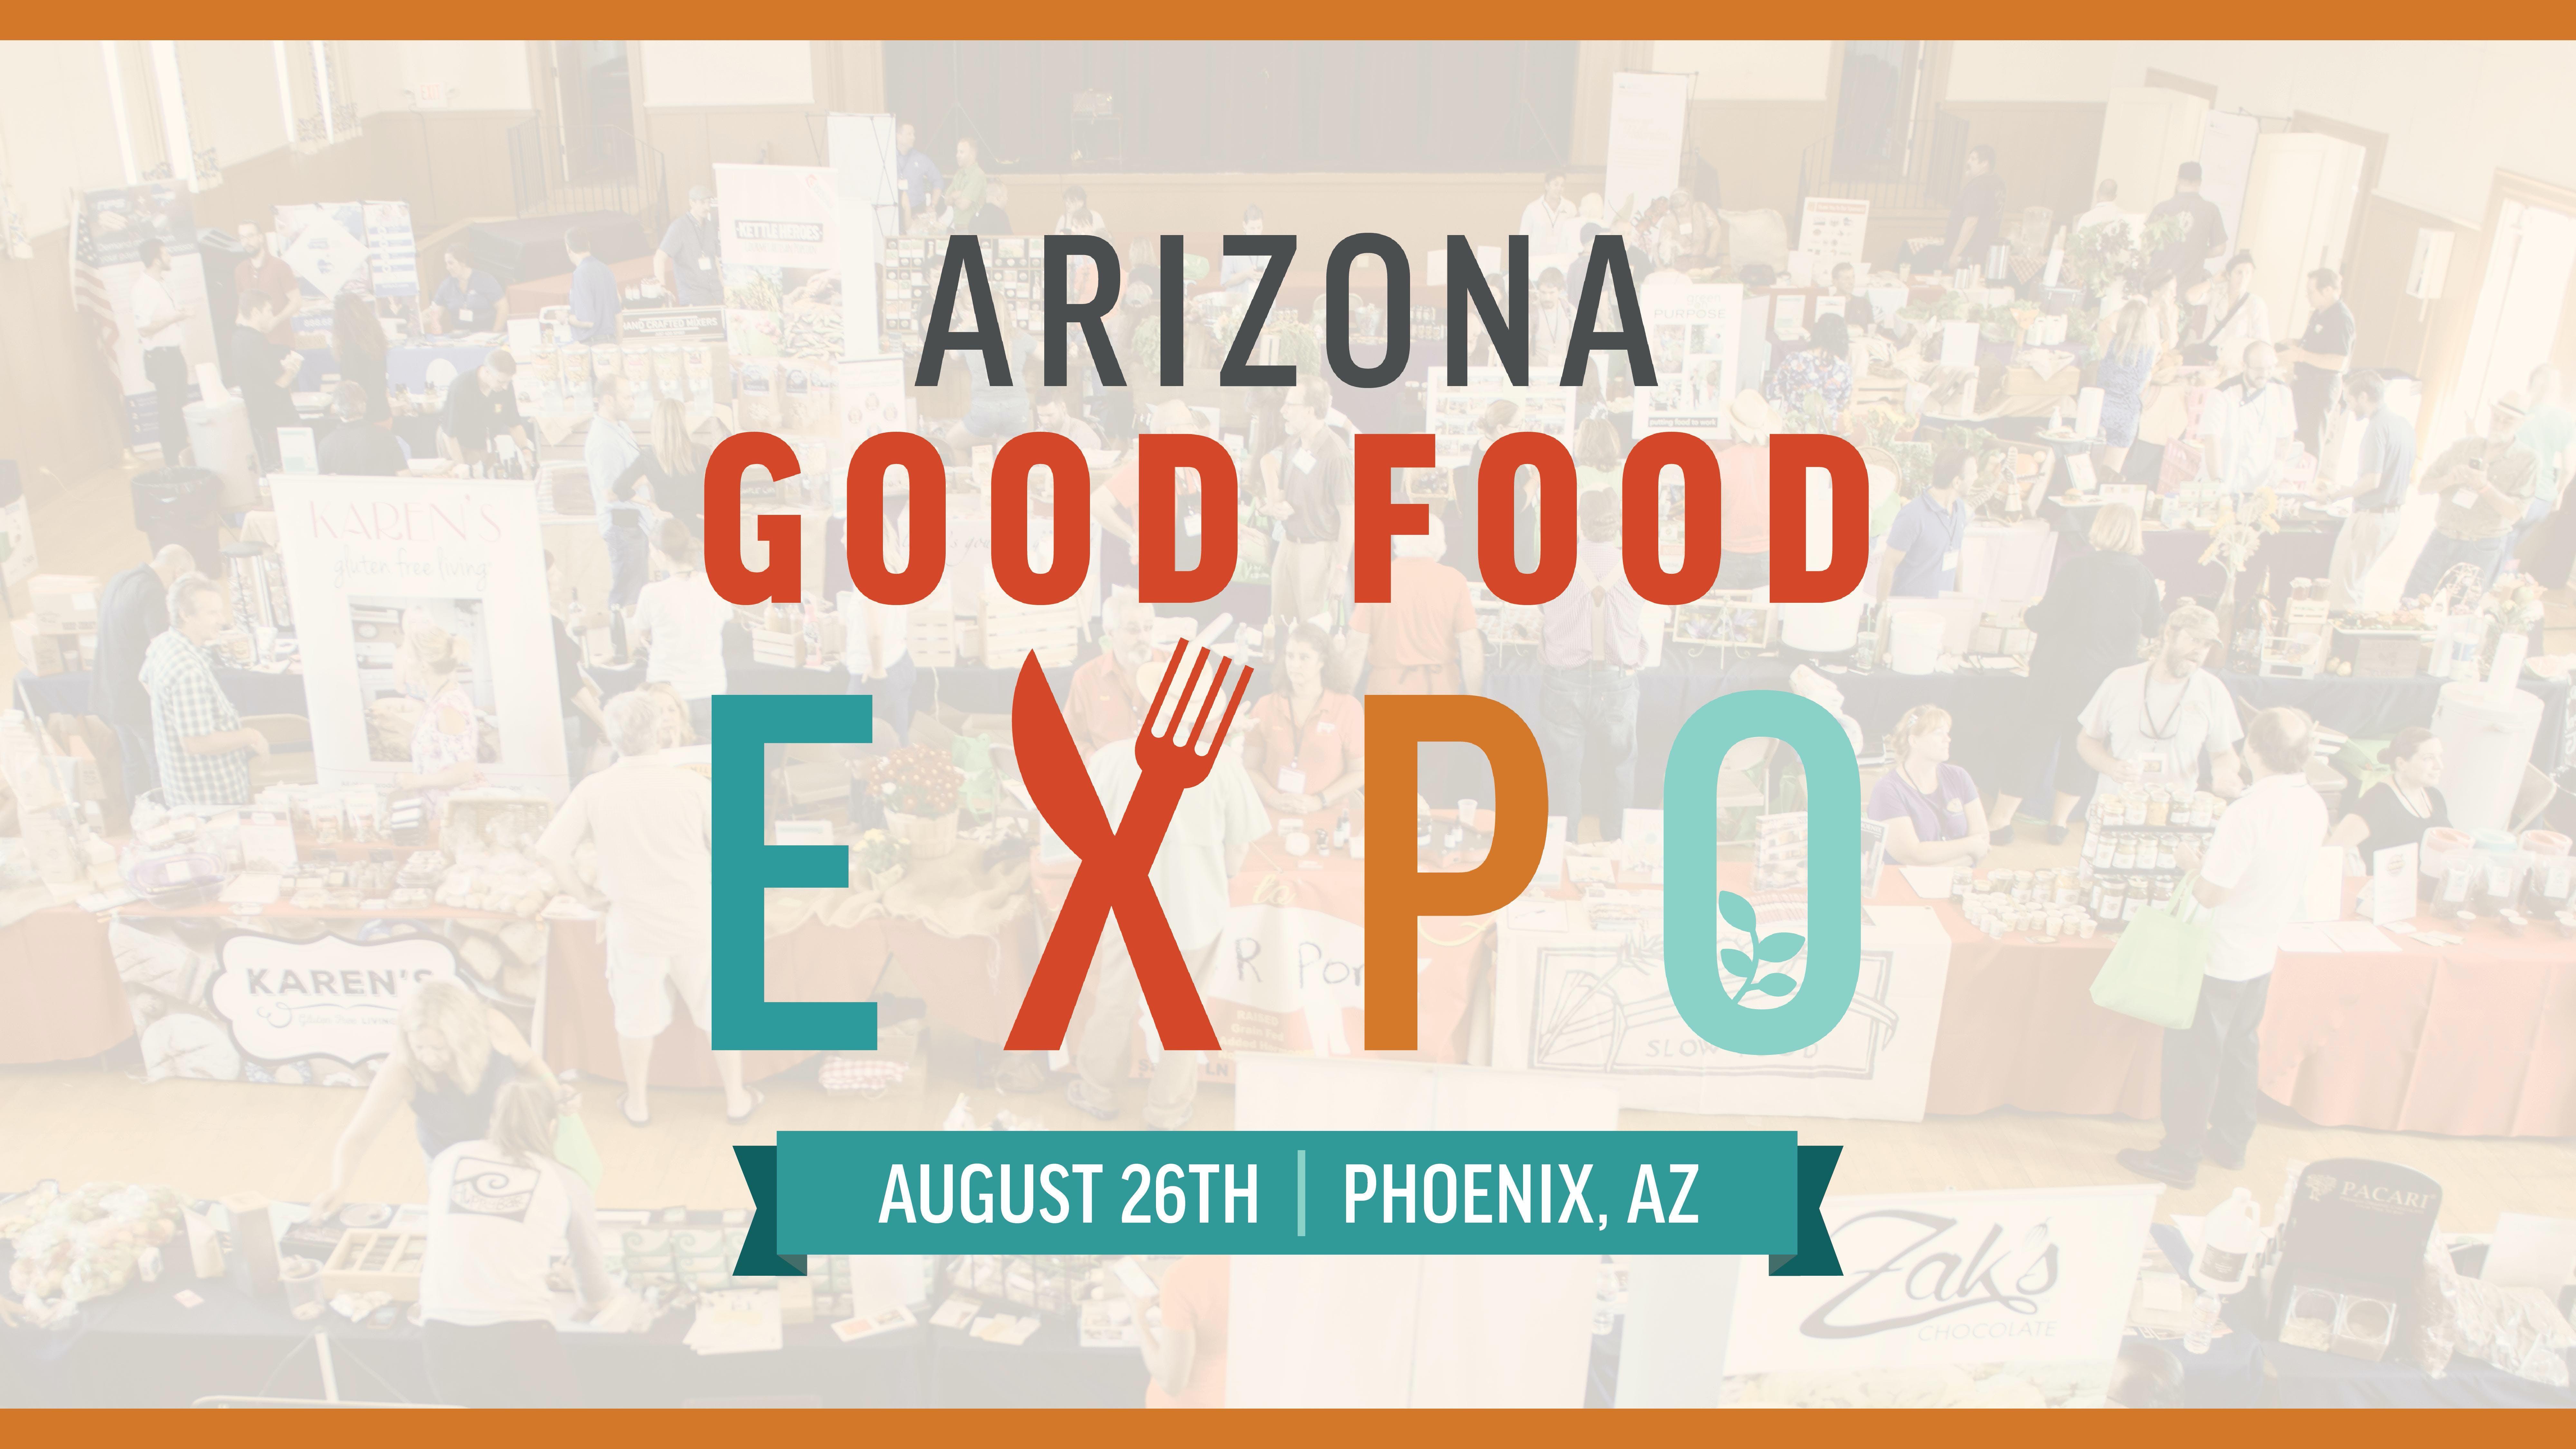 2019 Arizona Good Food Expo